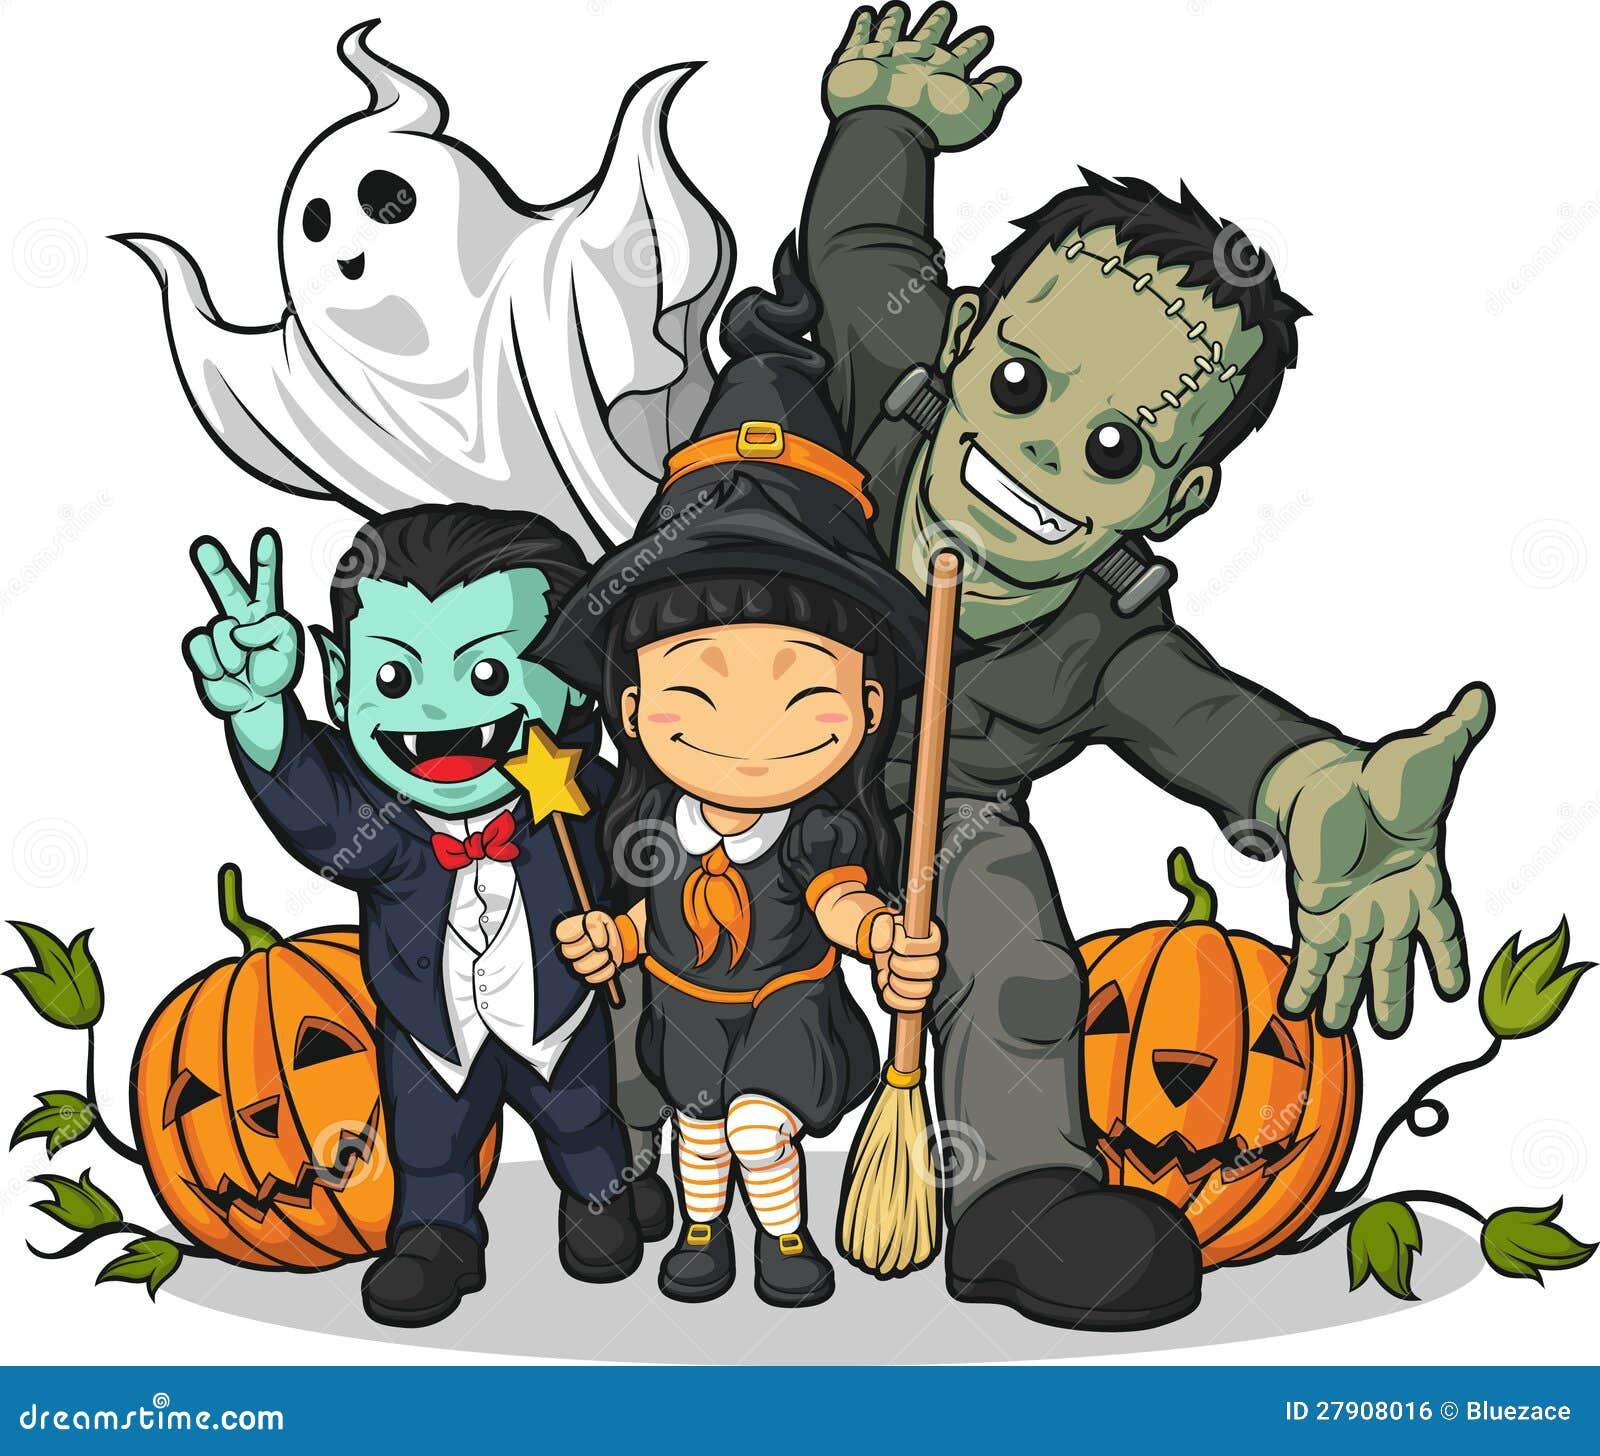 vampiro fantasma: